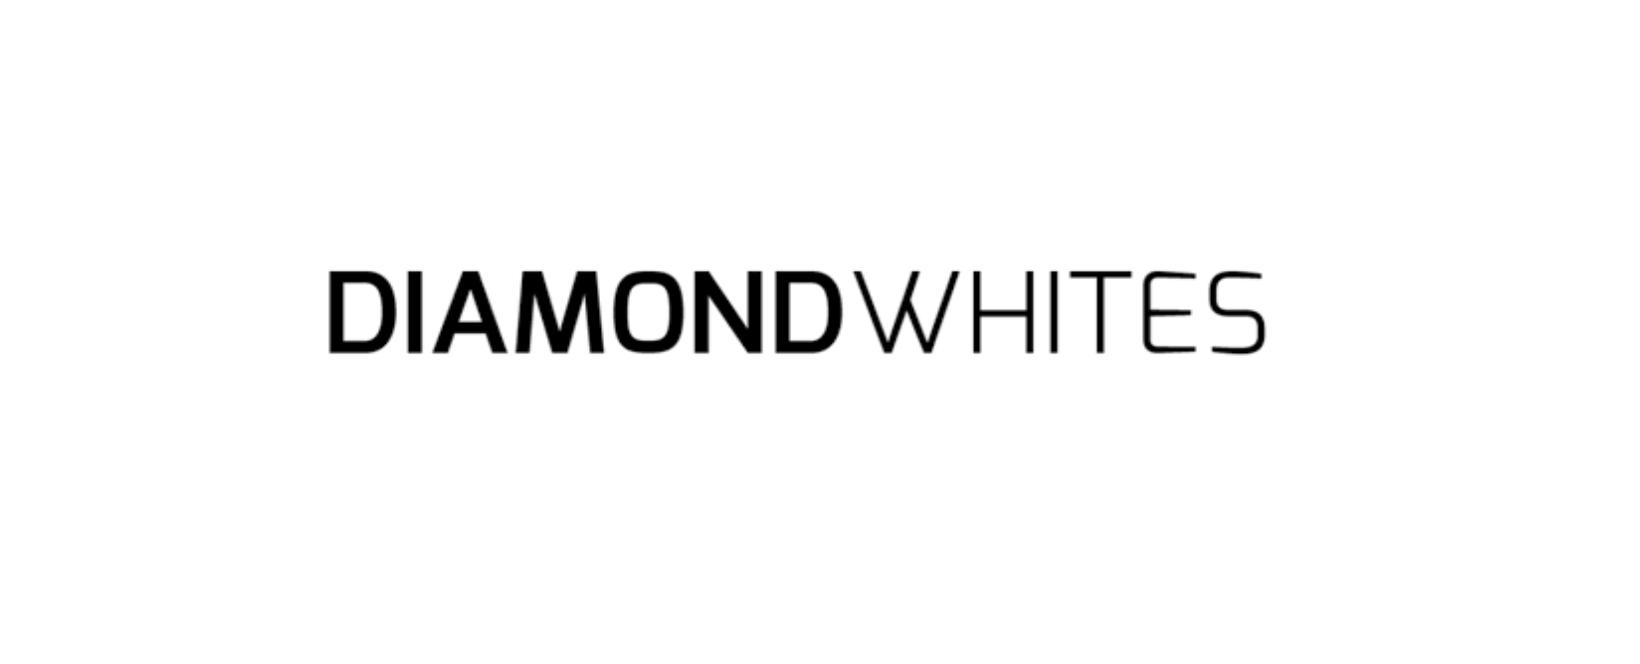 Diamond Whites Discount Code 2021